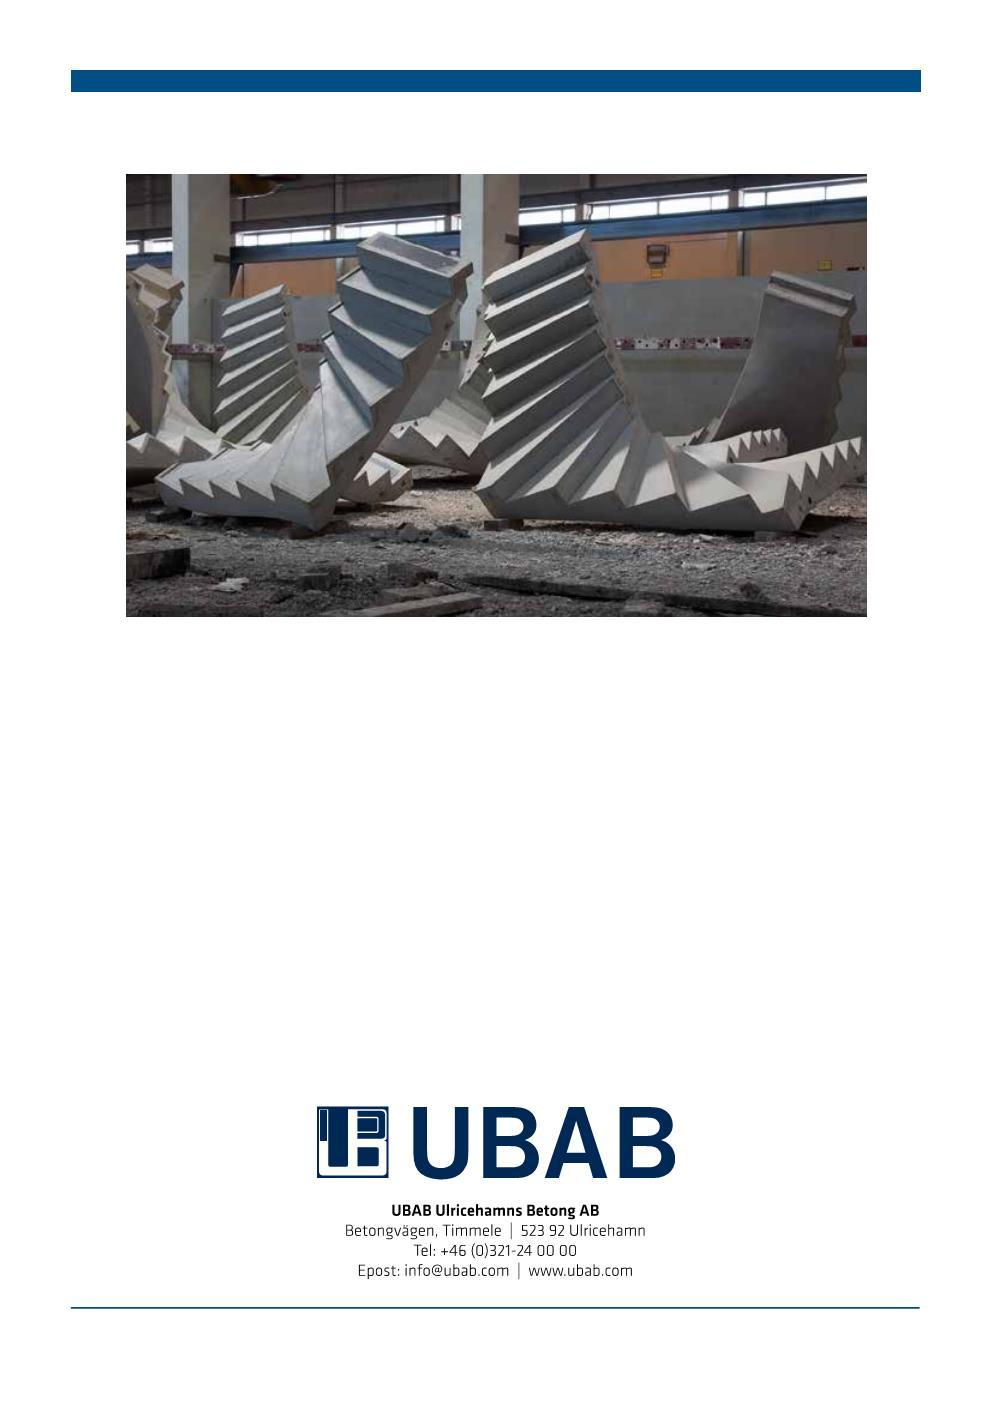 UBAB Hållbarhetsredovisning 2018_webres Sida 020